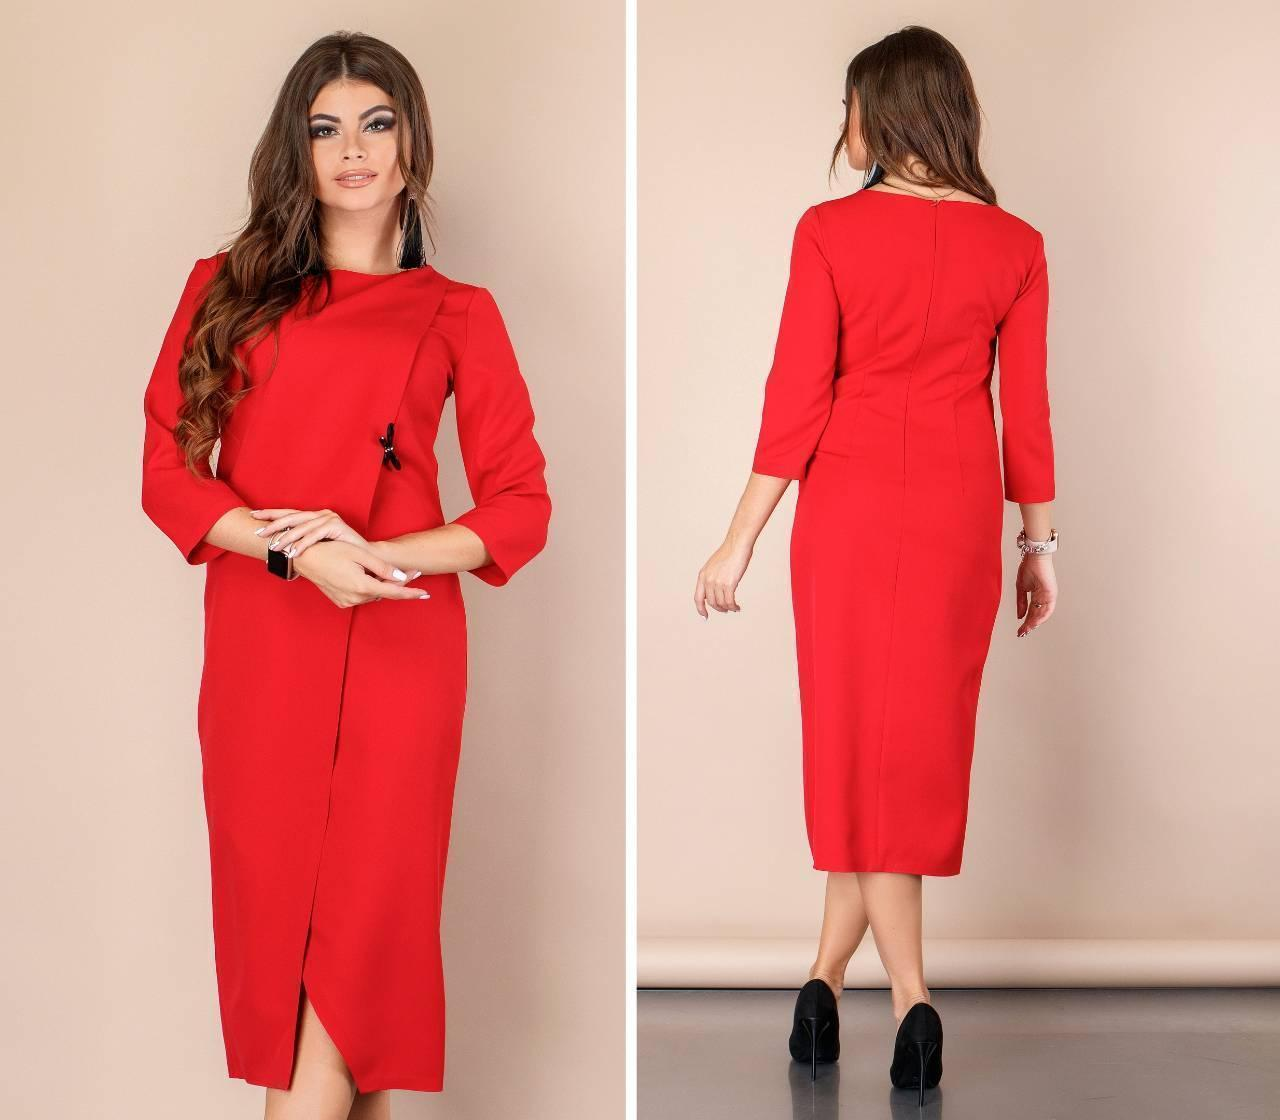 Платье на запах ( арт. 131 ), ткань креп, цвет красный